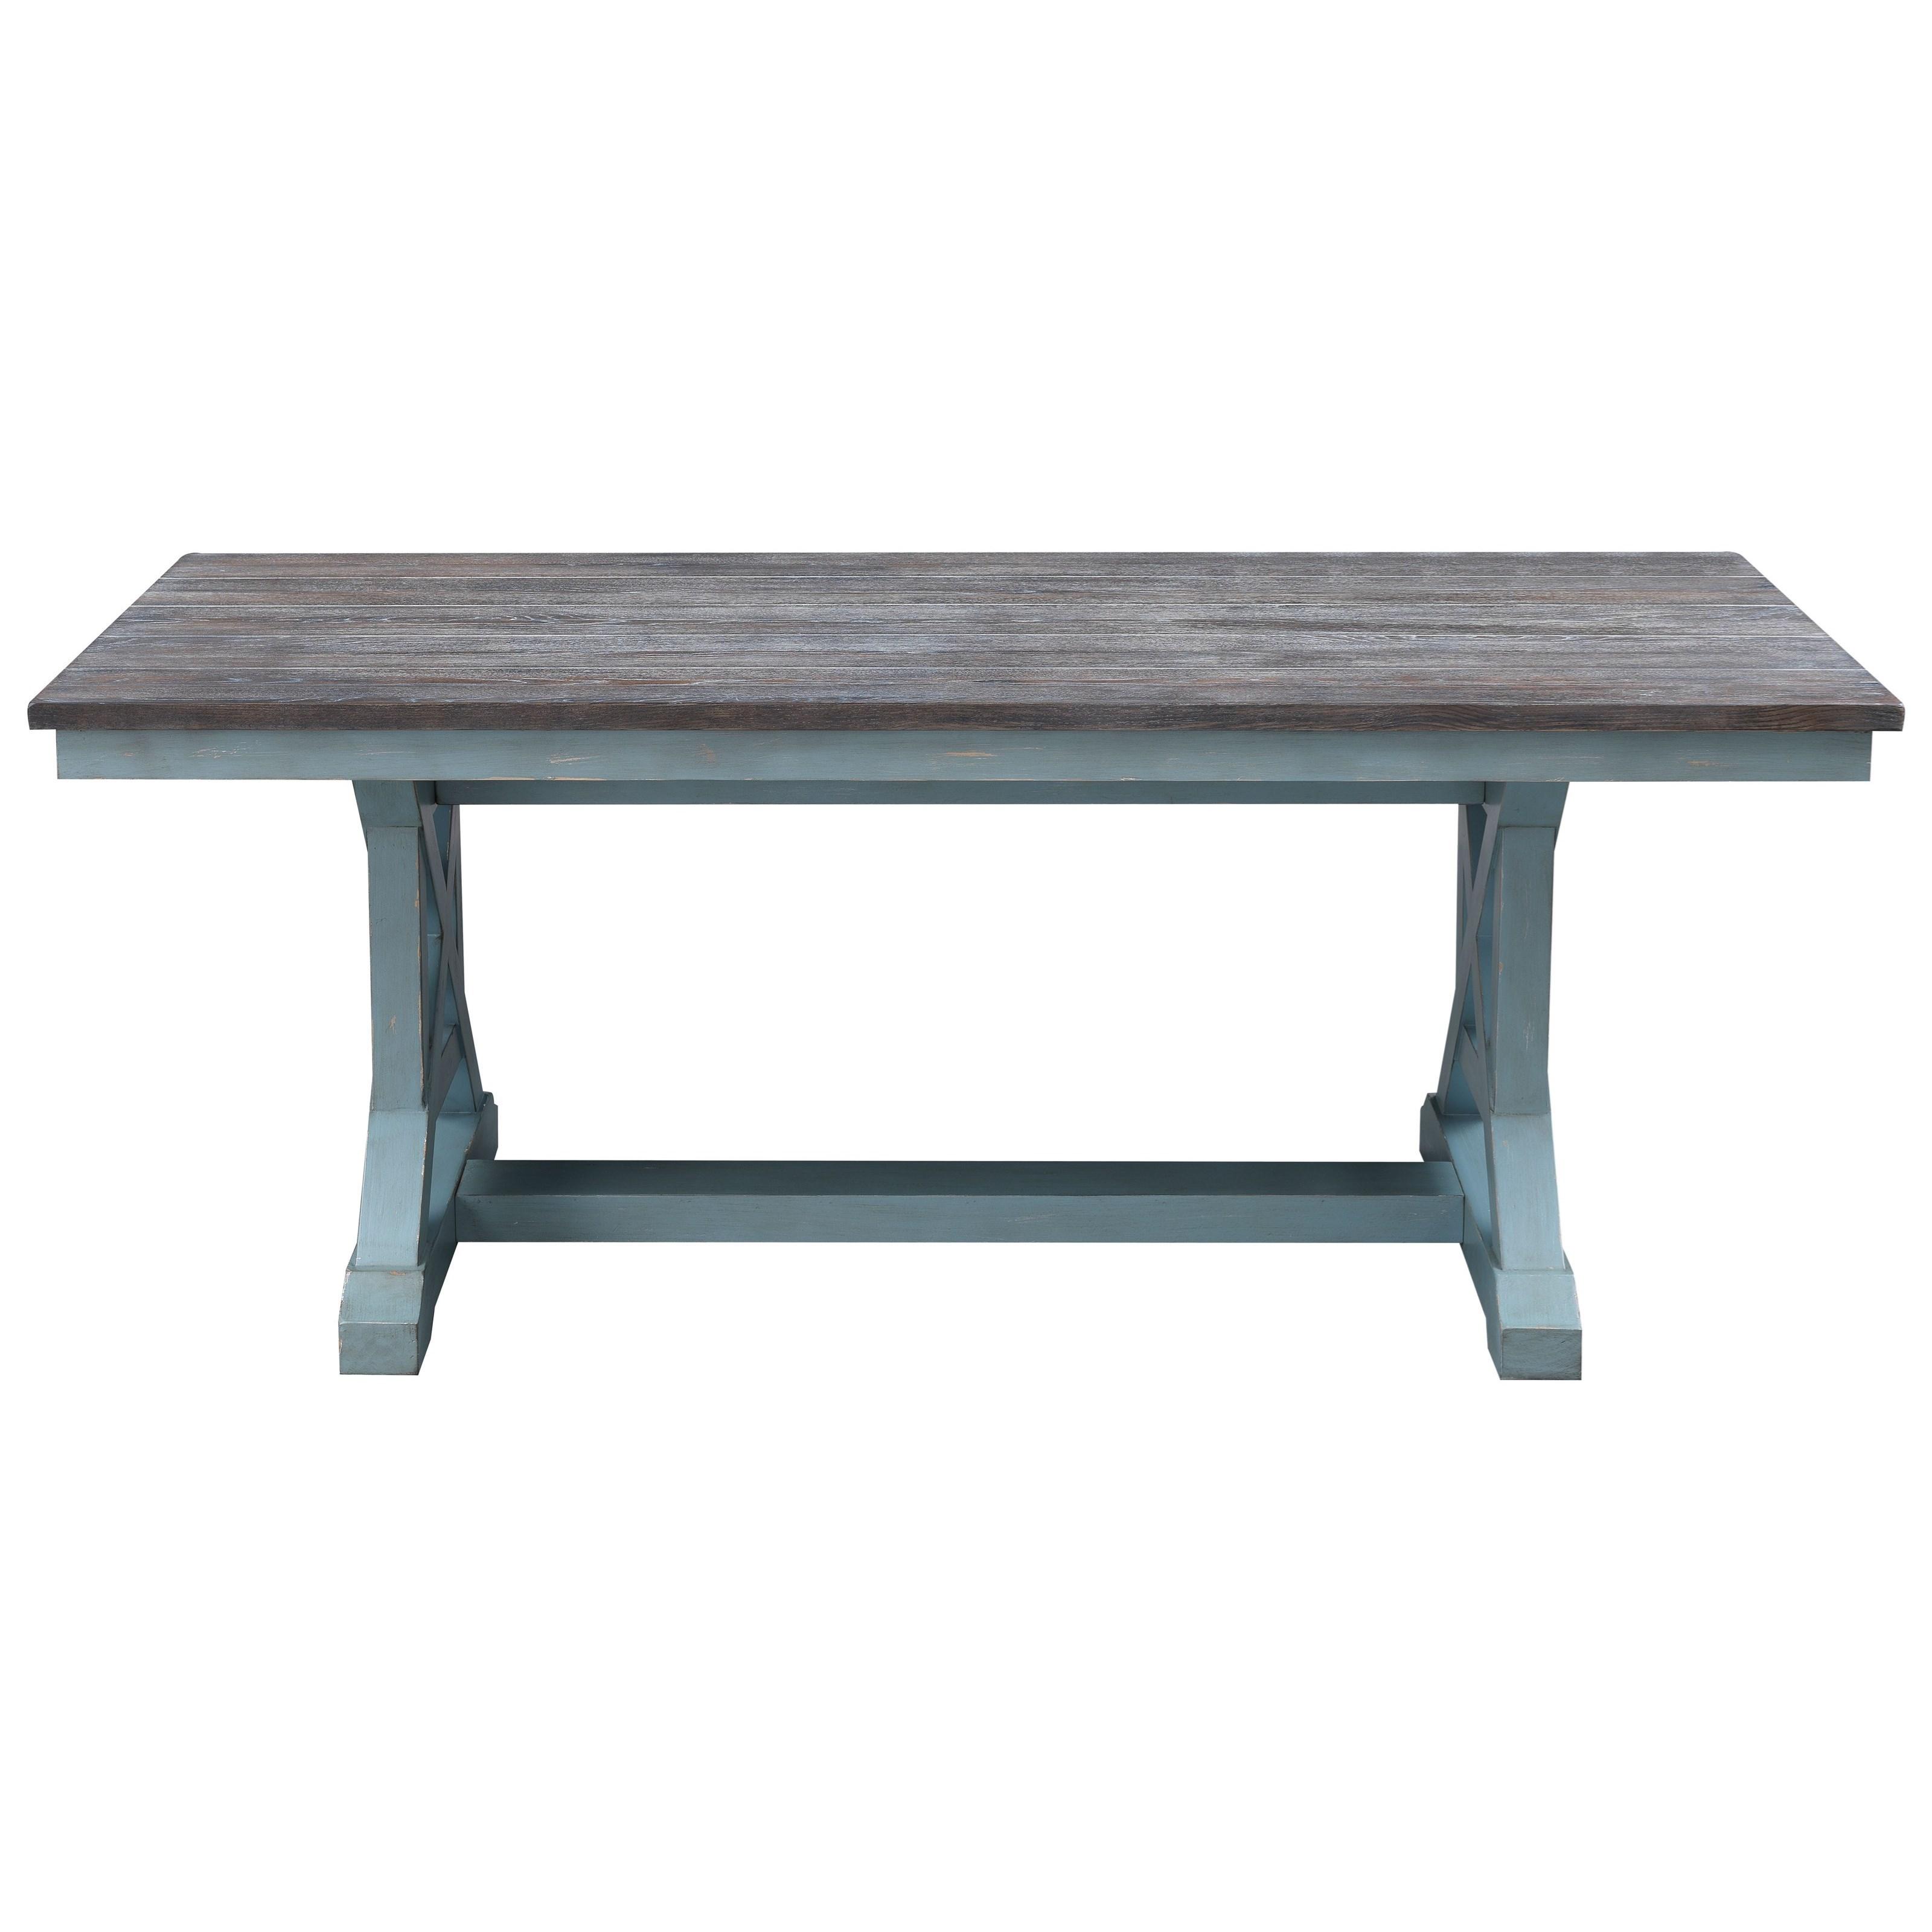 Two-Tone Rectangular Trestle Dining Table